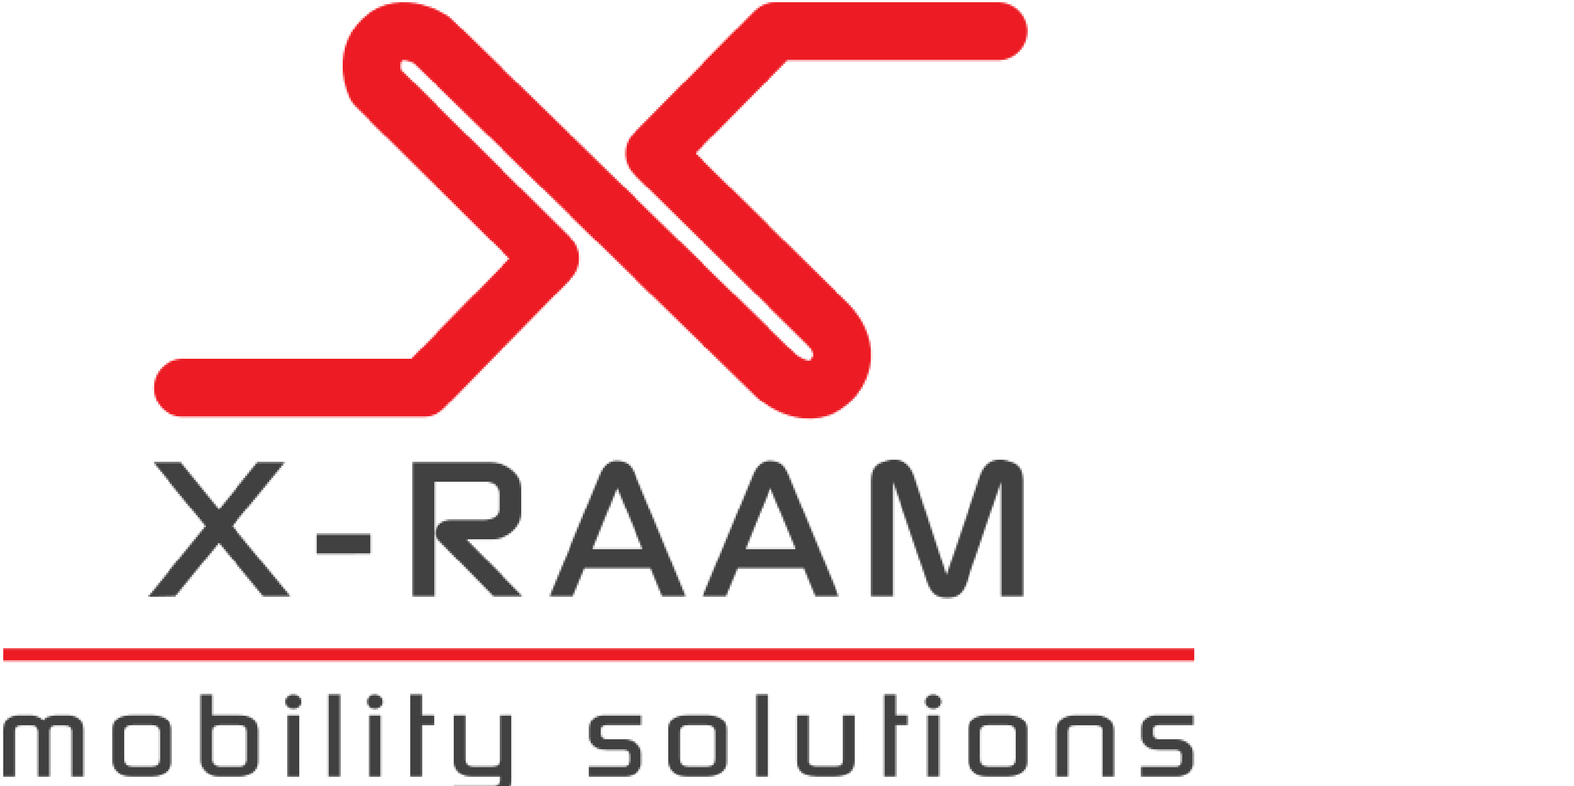 X Raam